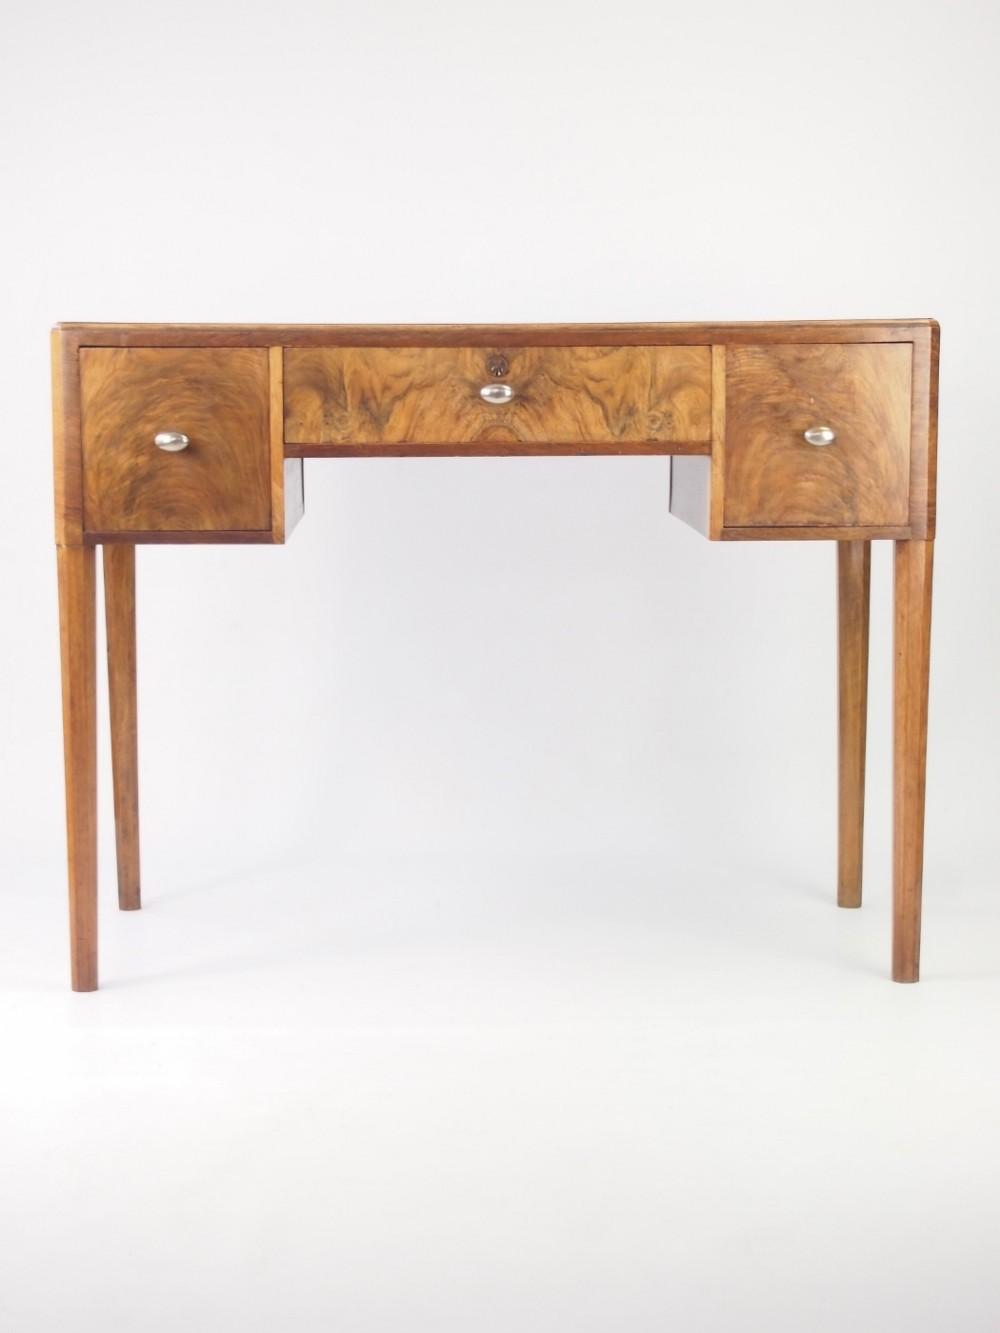 small deco desk in walnut 331321 sellingantiques co uk